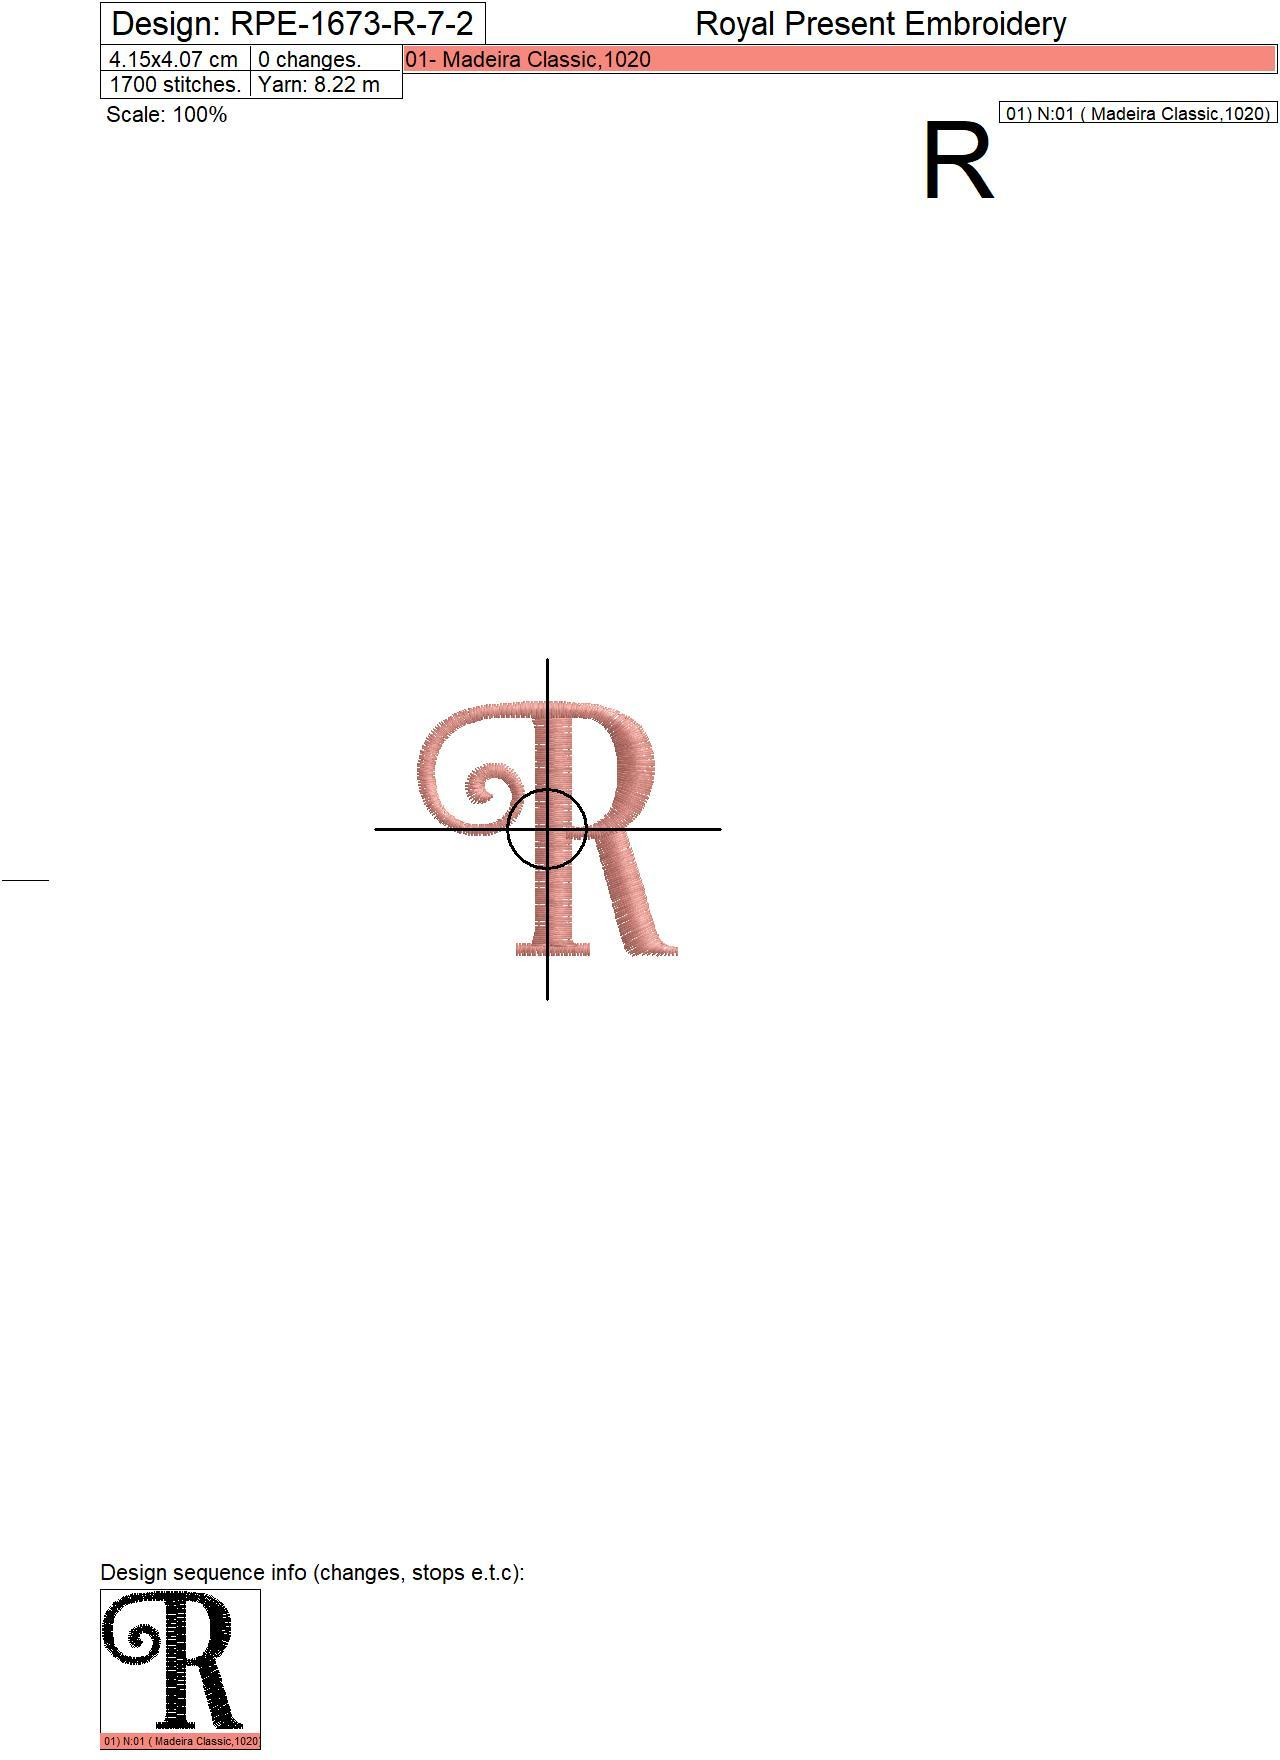 Capital Letter R Embroidery design V7